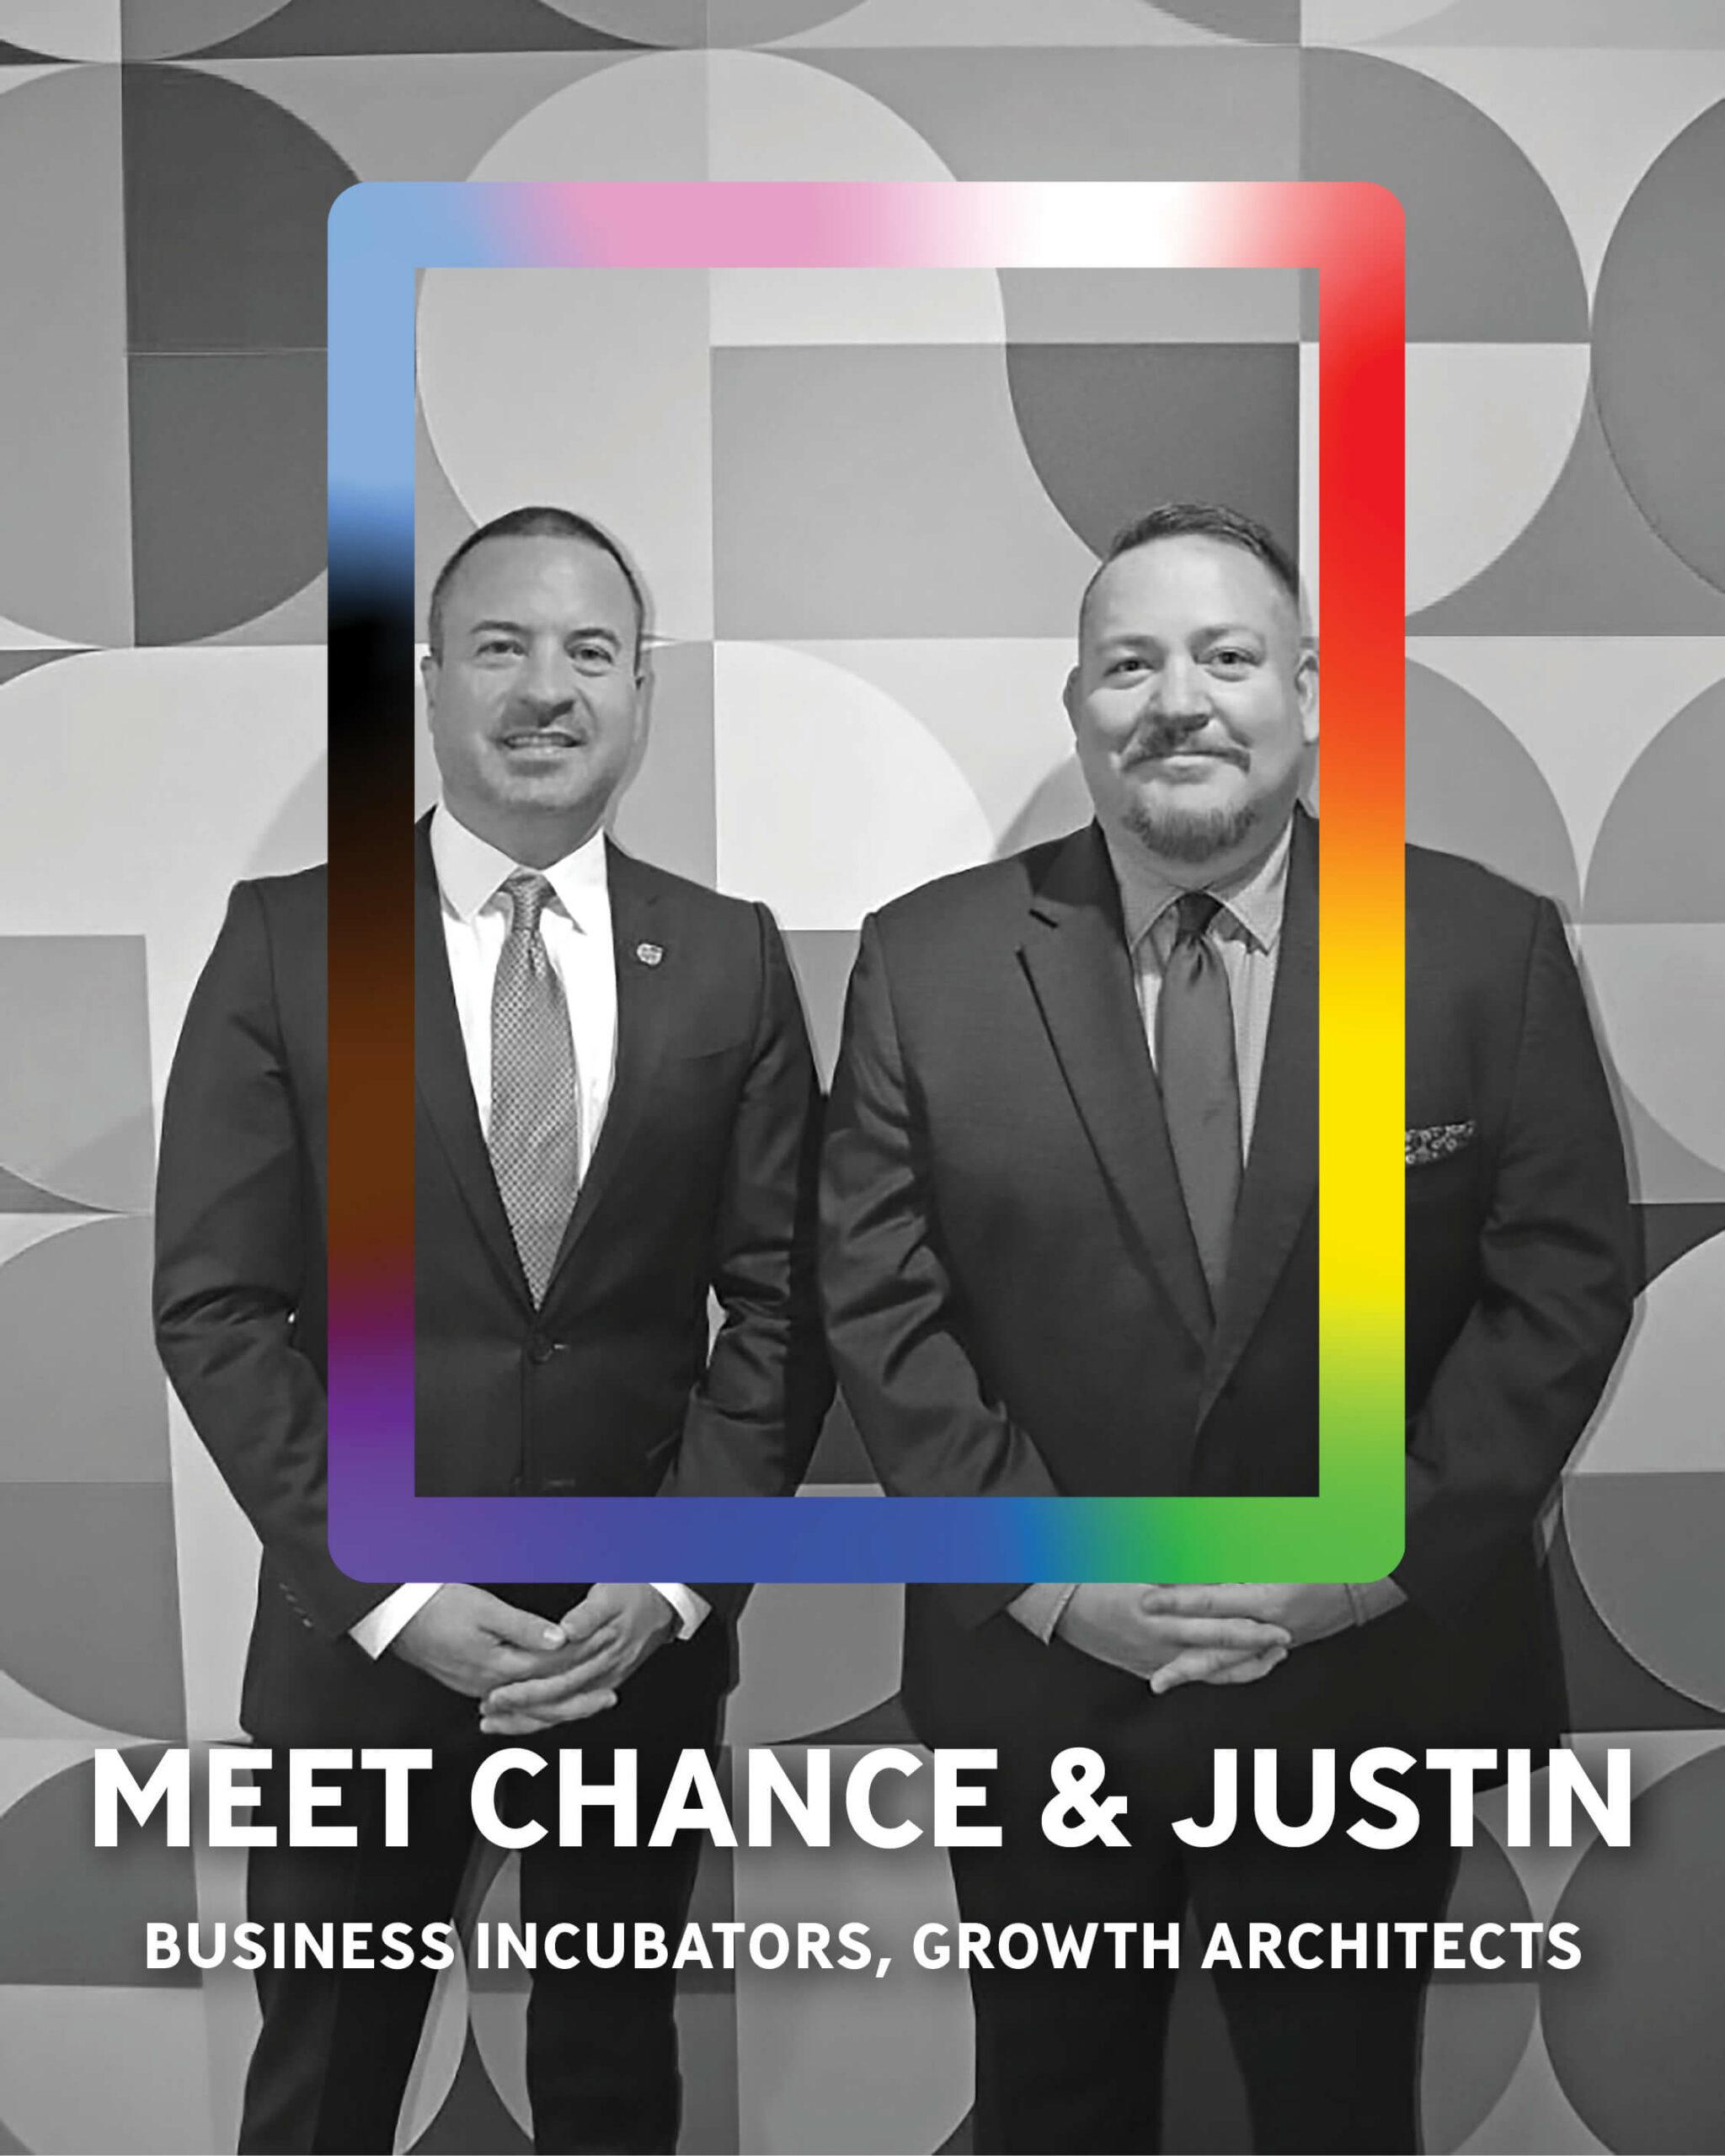 MIXX_25th_GrowthAgents_Social_Media_Justin-Chance